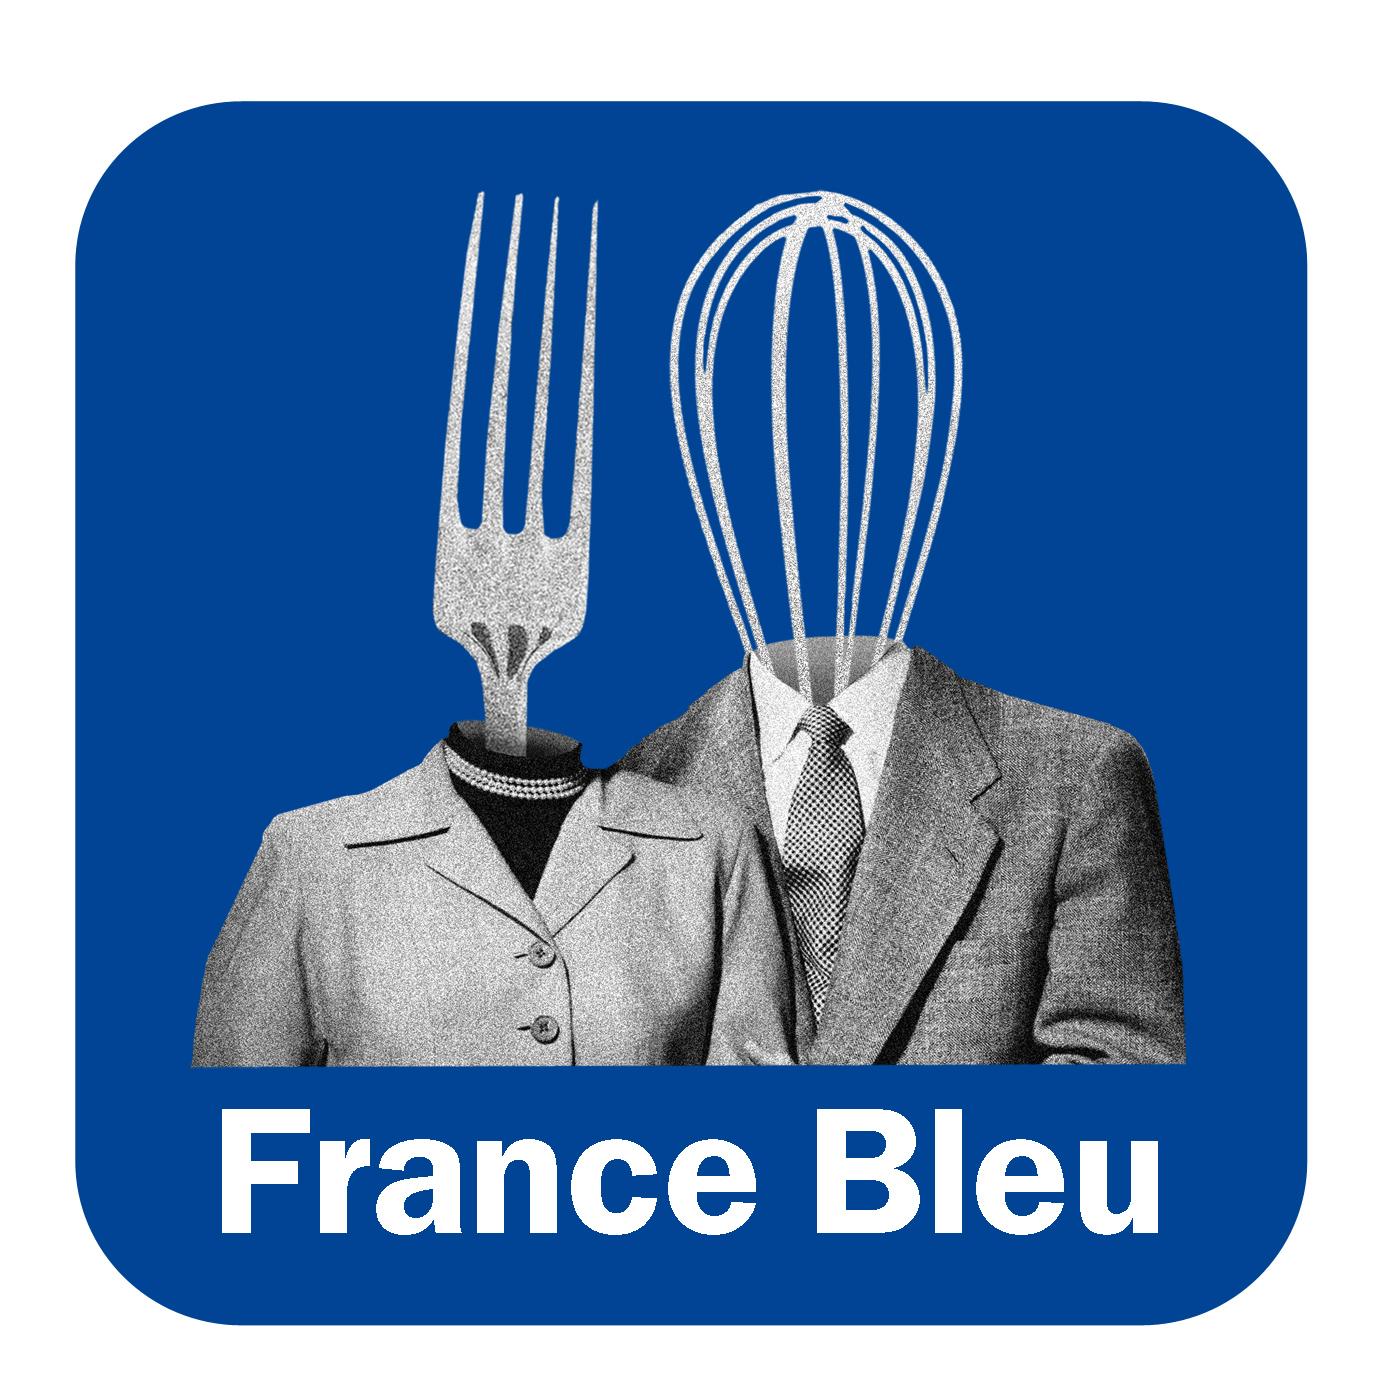 Le dessus du panier France Bleu Gironde